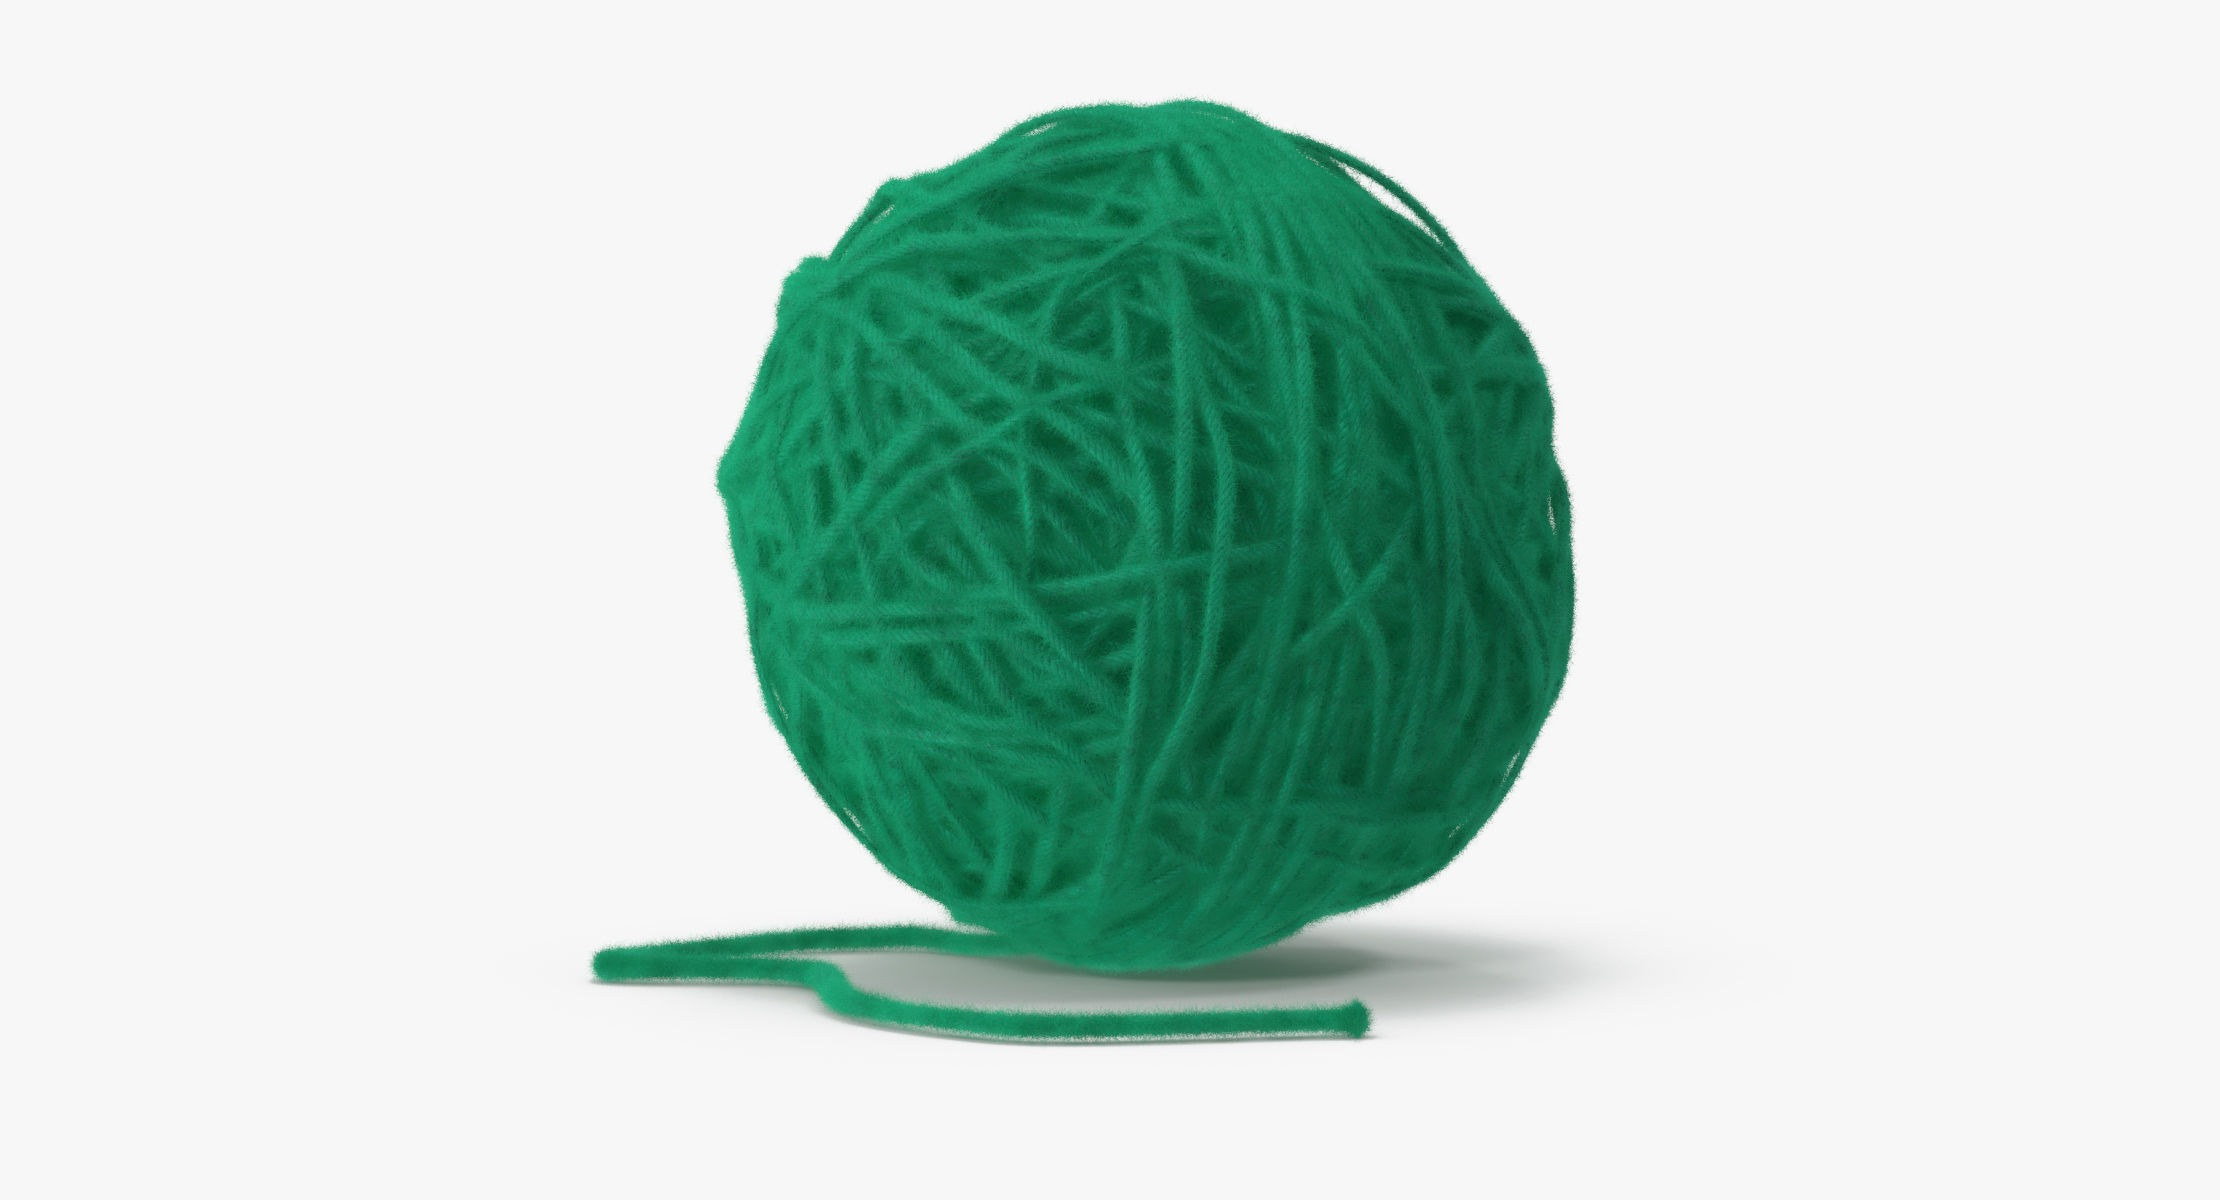 Ball of Yarn Dark Green - reel 1